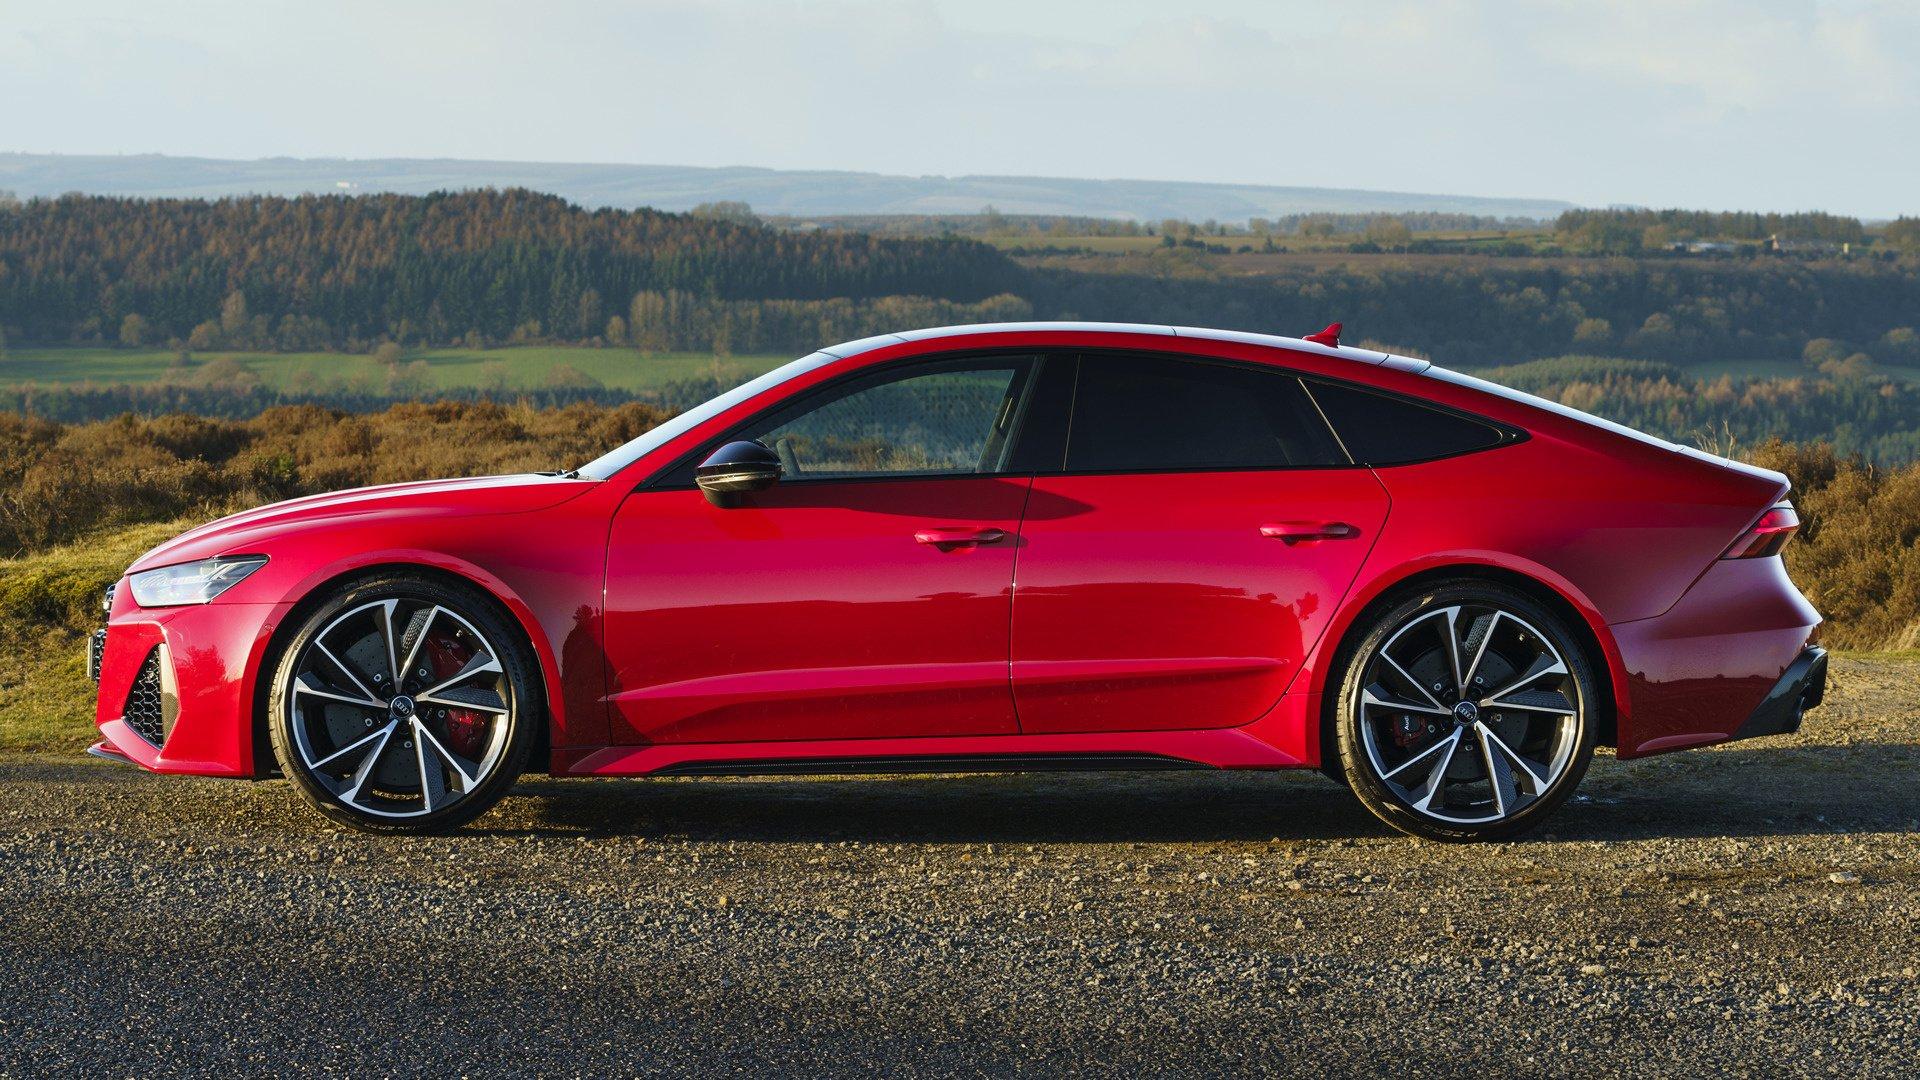 2020 Audi Rs7 Sportback Fond D Ecran Hd Arriere Plan 1920x1080 Id 1070843 Wallpaper Abyss